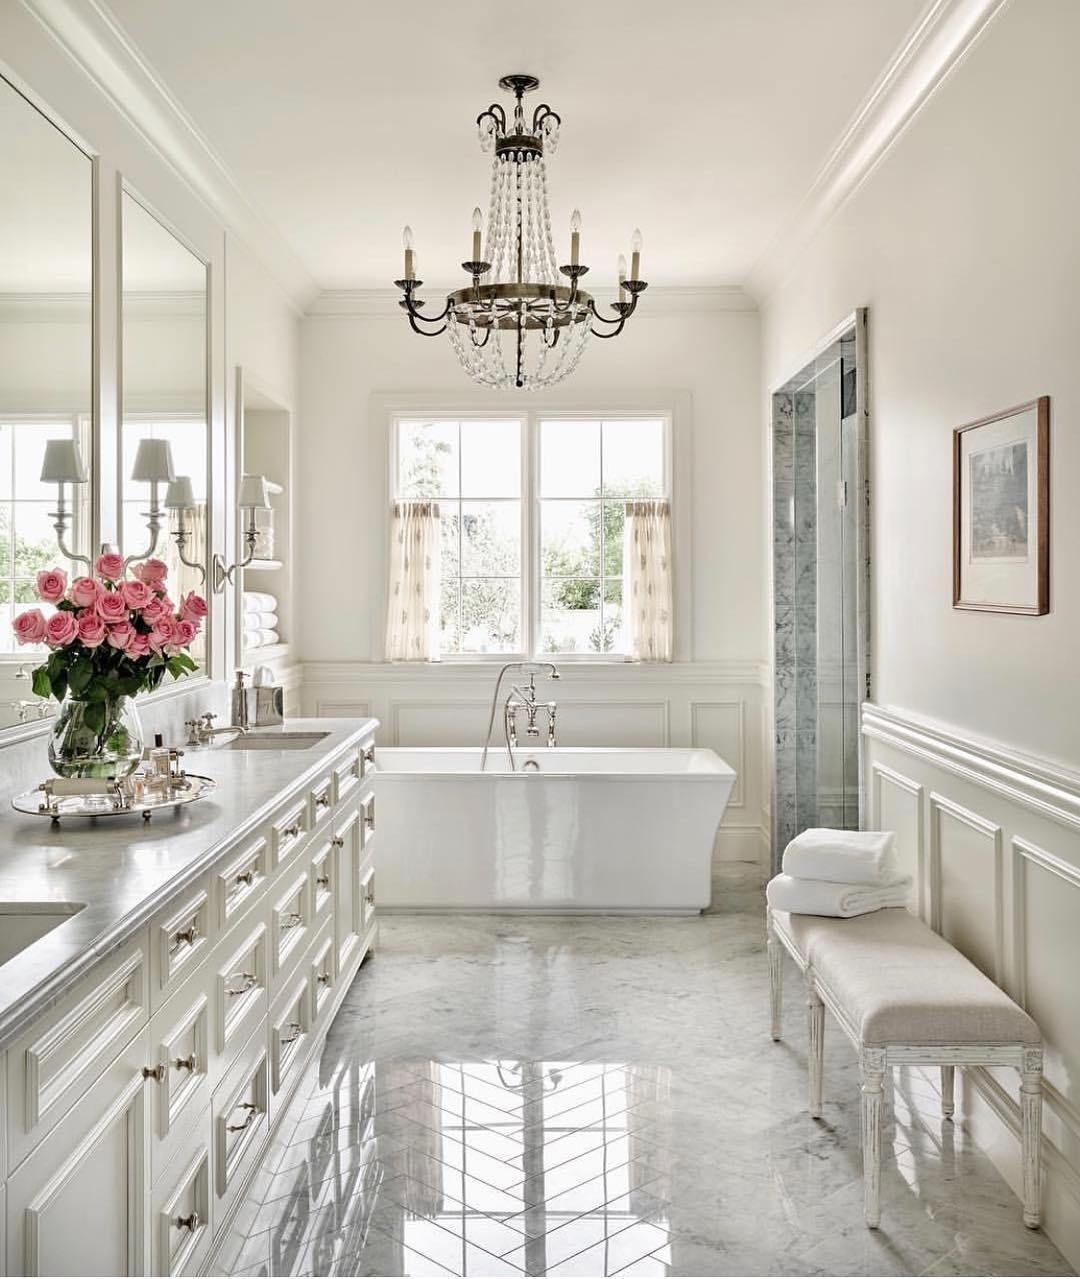 White Bathroom Ideas in 2020 | White master bathroom ...